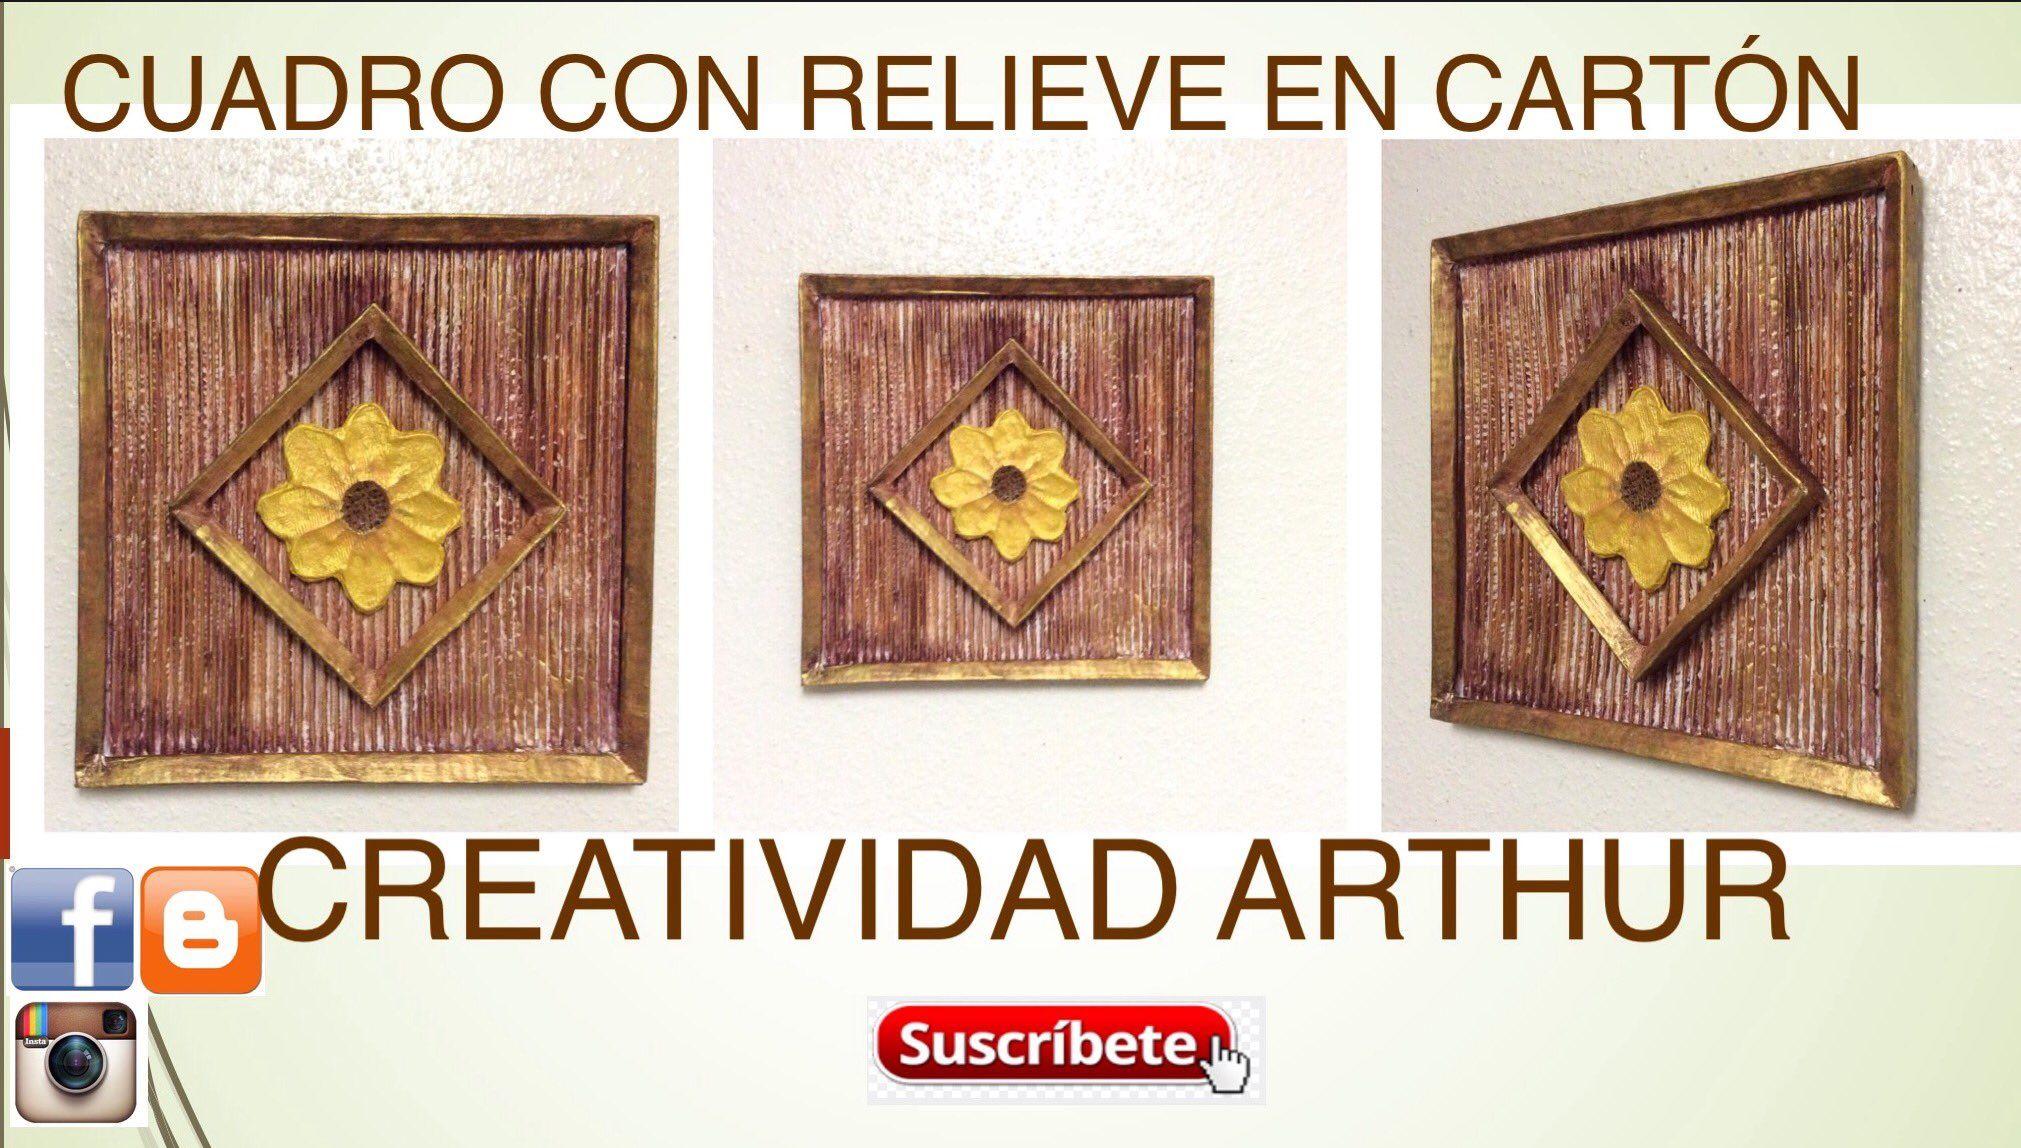 "Creatividad arthur on Twitter: ""Si te gustan los cuadros , vamos a ver el paso a paso cuadro con relieve en cartón 😀👍 https://t.co/dsh2W9FPsQ https://t.co/ZJY0OPi3MW"""